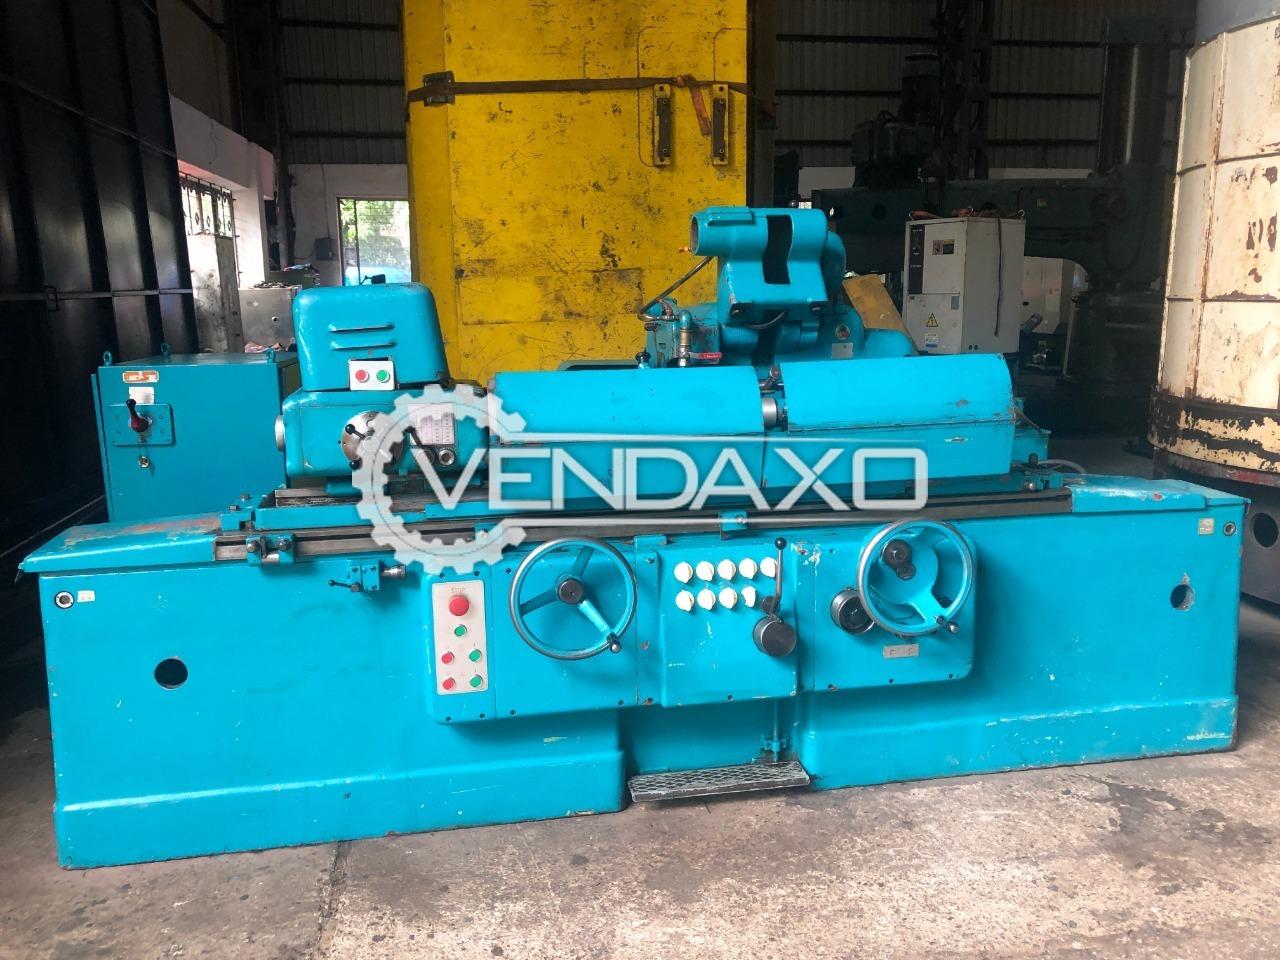 TOS BUA 31 x 1000 Cylindrical Grinder Machine - 1000 x 310 mm